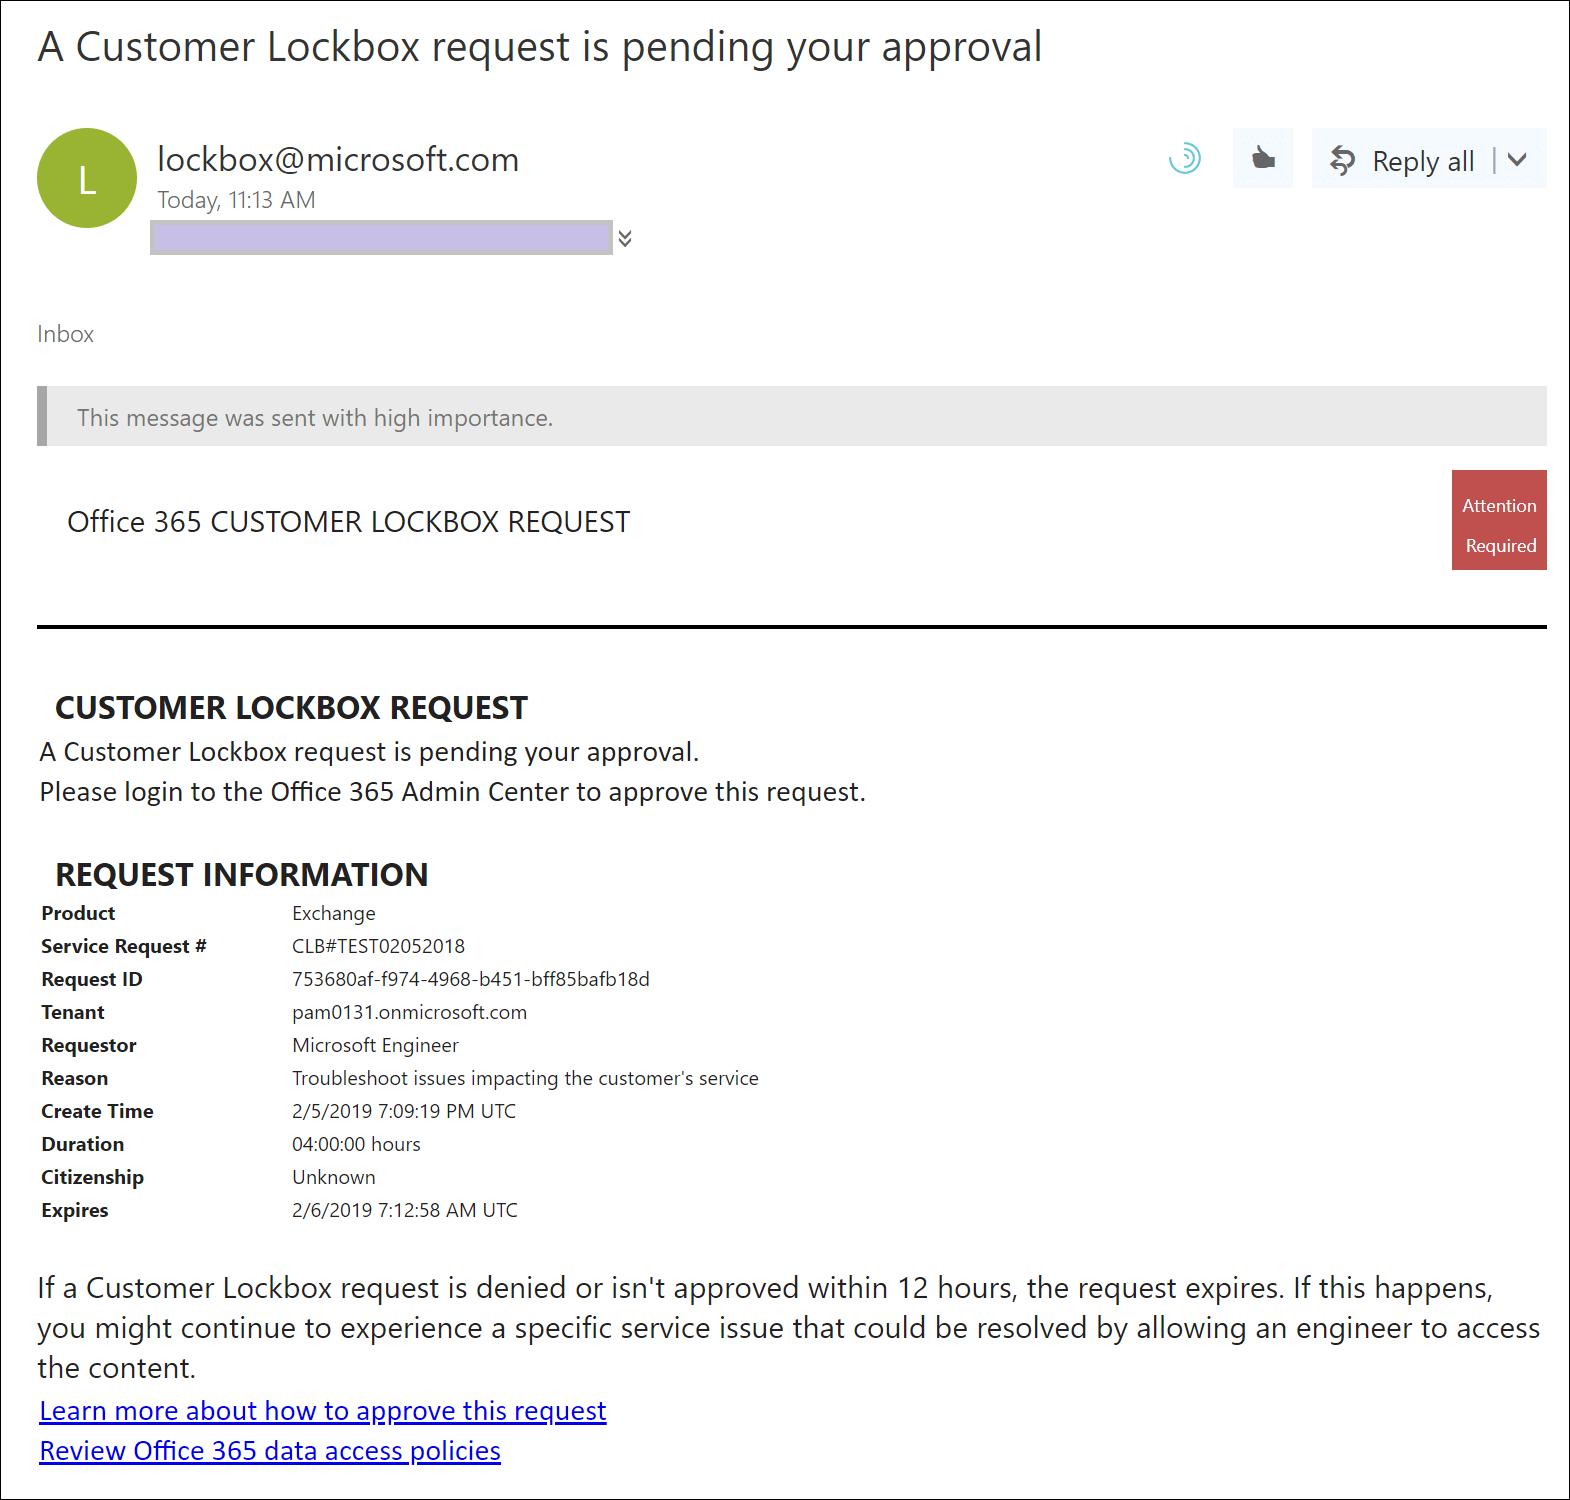 Office 365 Customer Lockbox Requests | Microsoft Docs